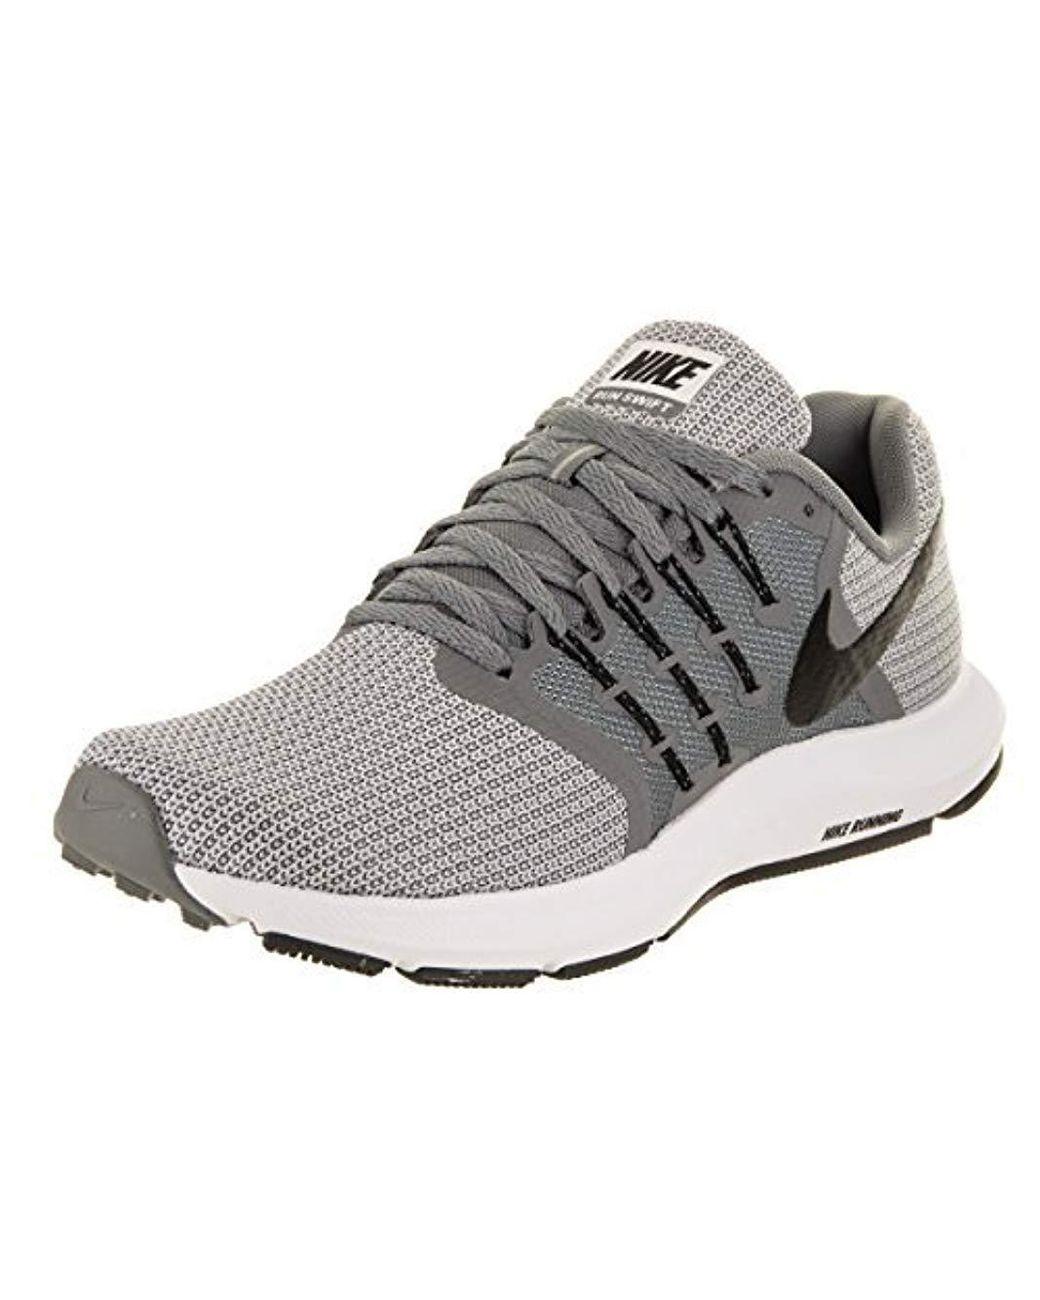 7988cada762fa Lyst - Nike Swift Running Shoe in Gray - Save 16%